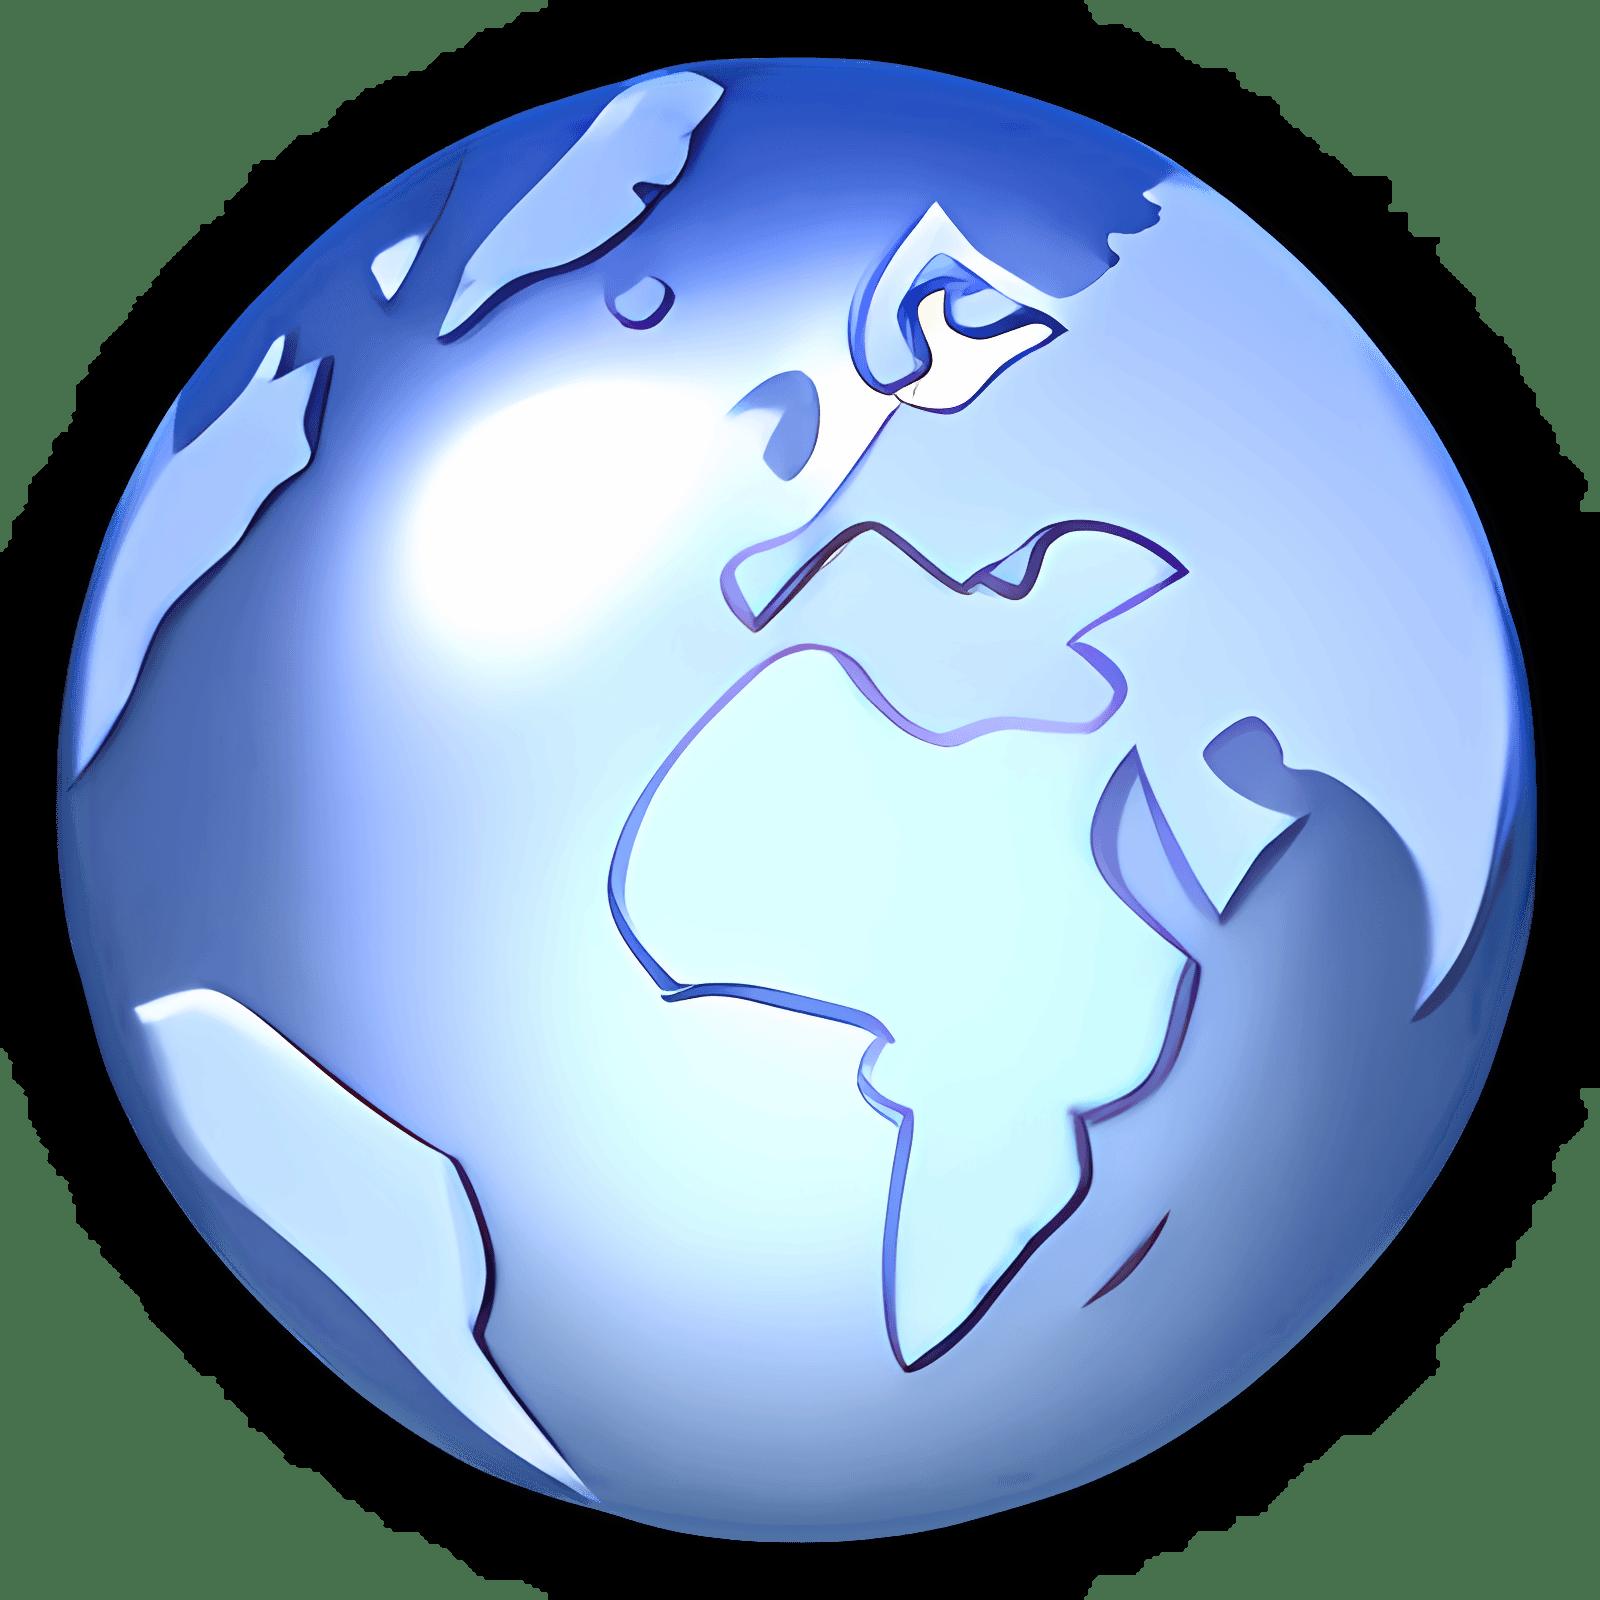 Earth Alerts